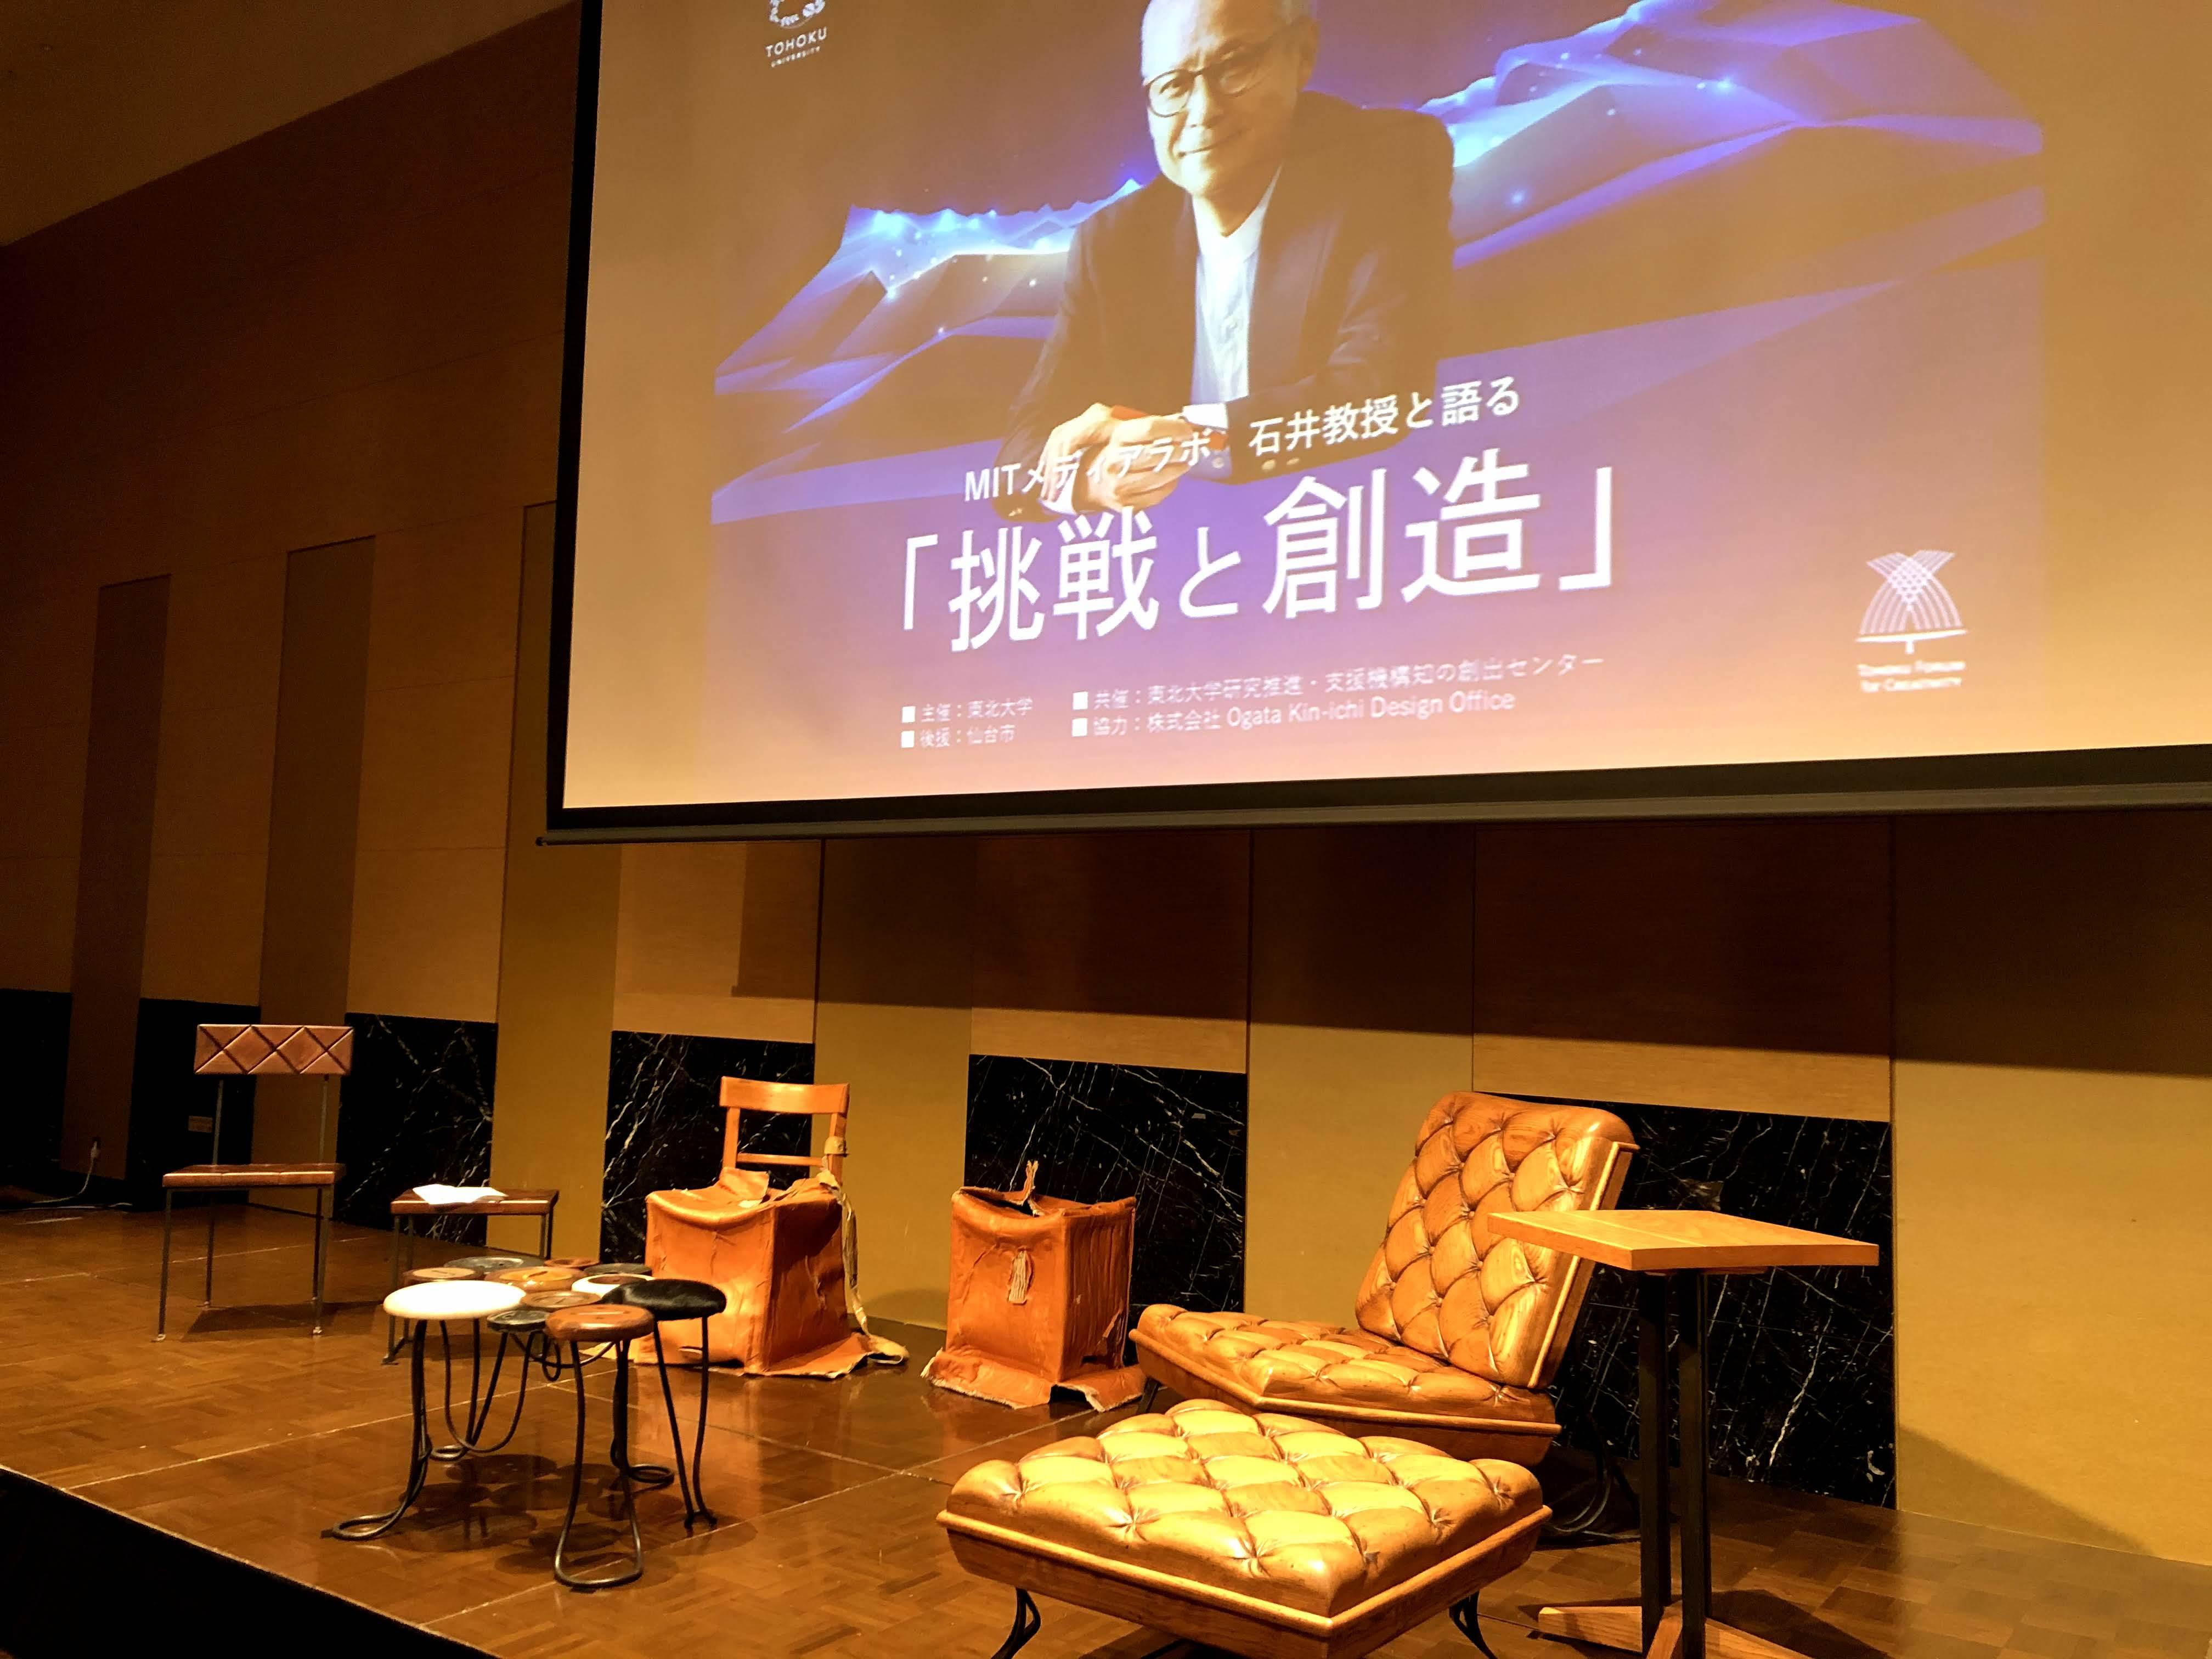 石井裕先生、再び仙台へ!_d0028322_10360173.jpg